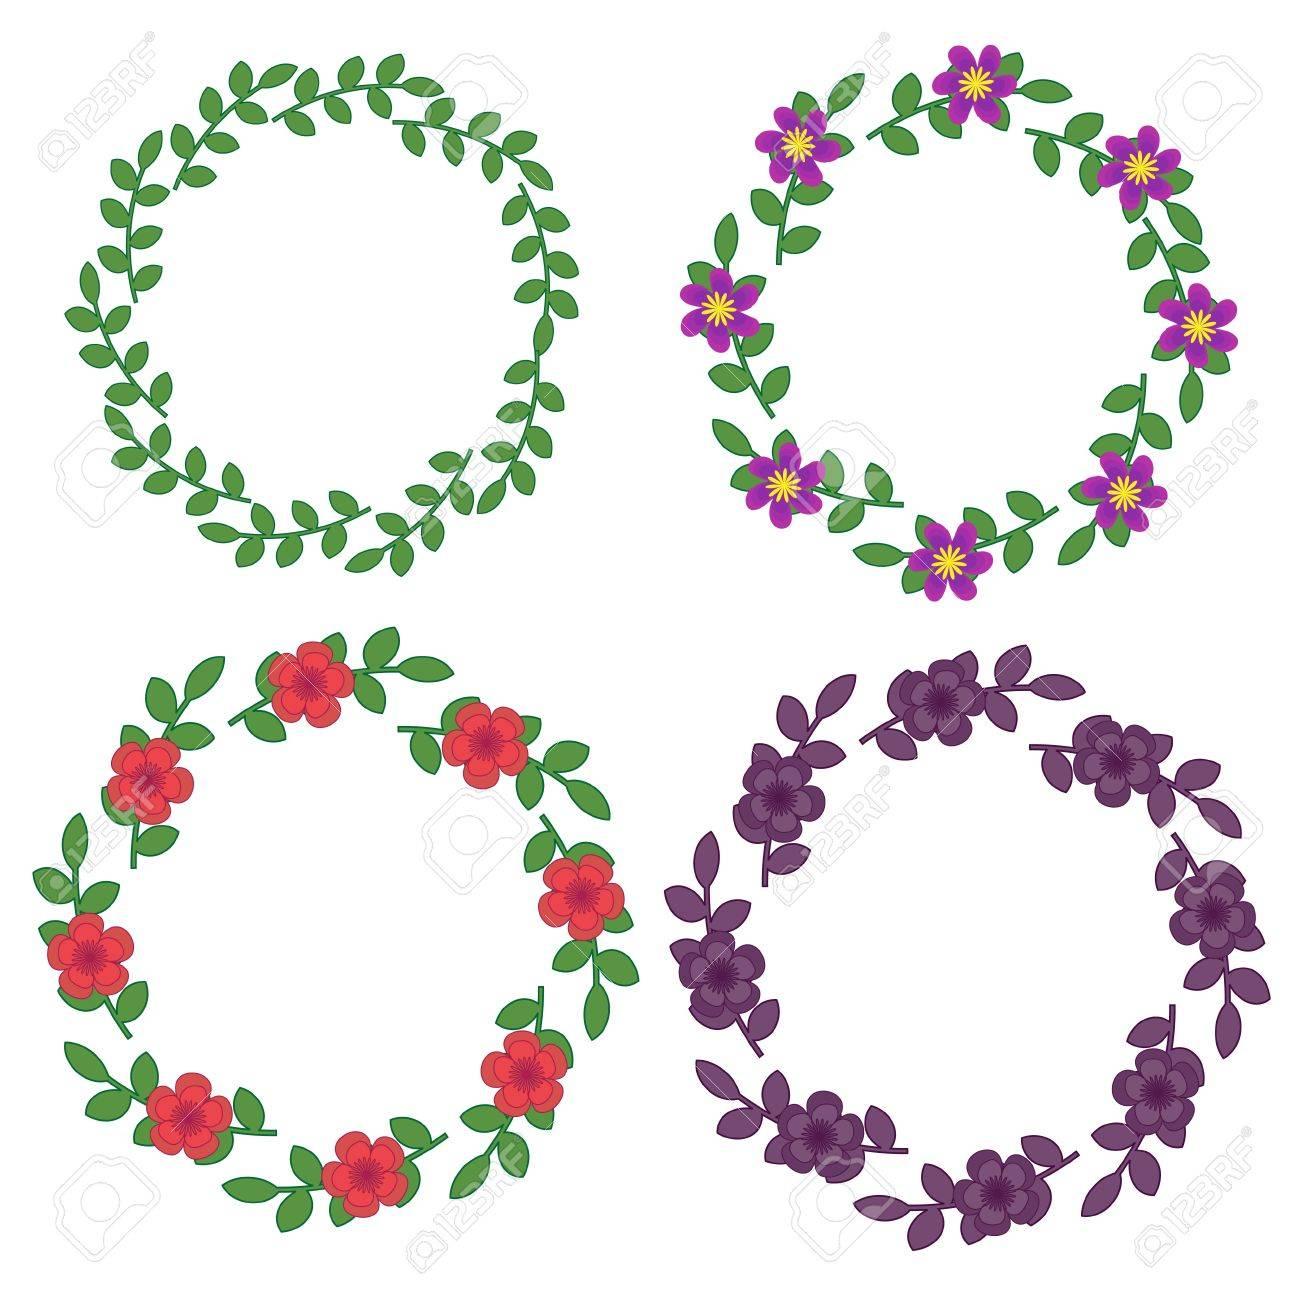 Decorative floral frames Stock Vector - 14072435